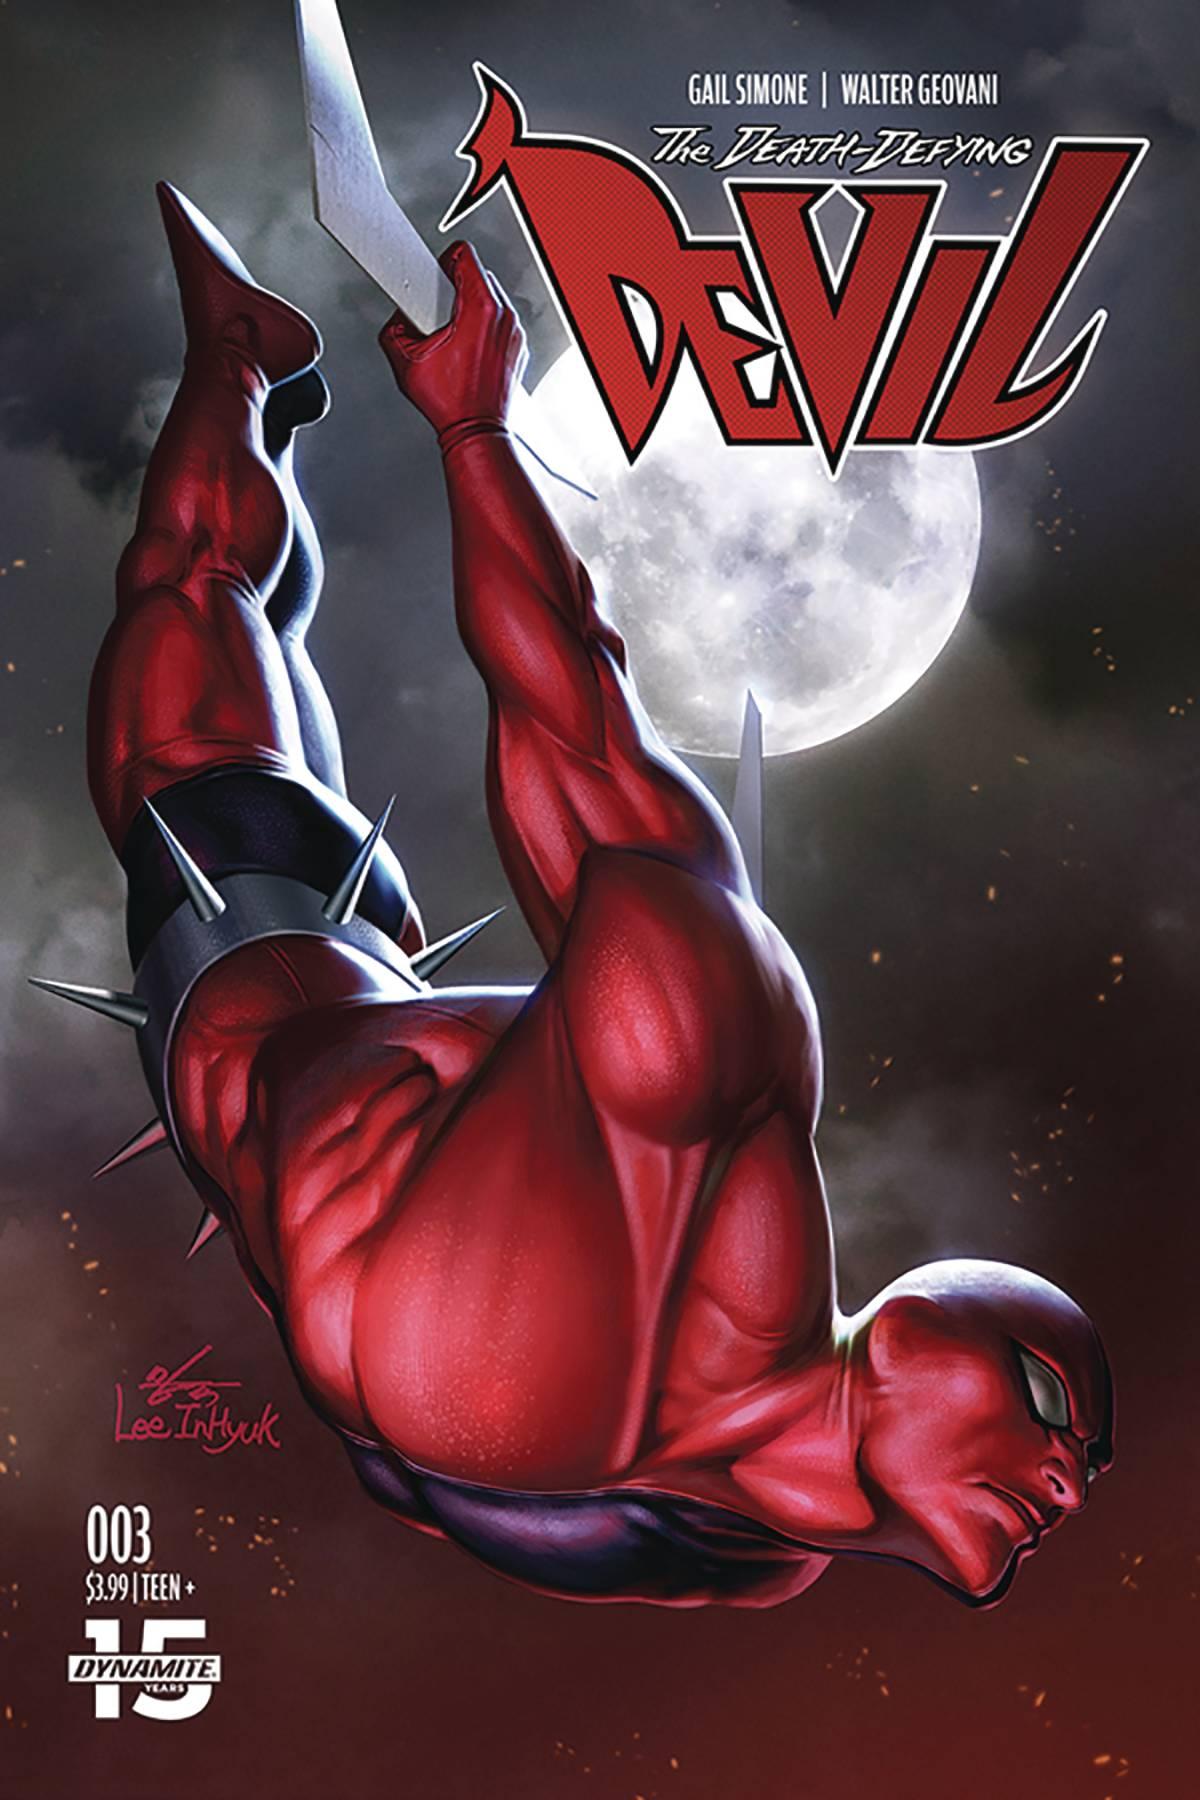 The Death Defying Devil #3 (2019)